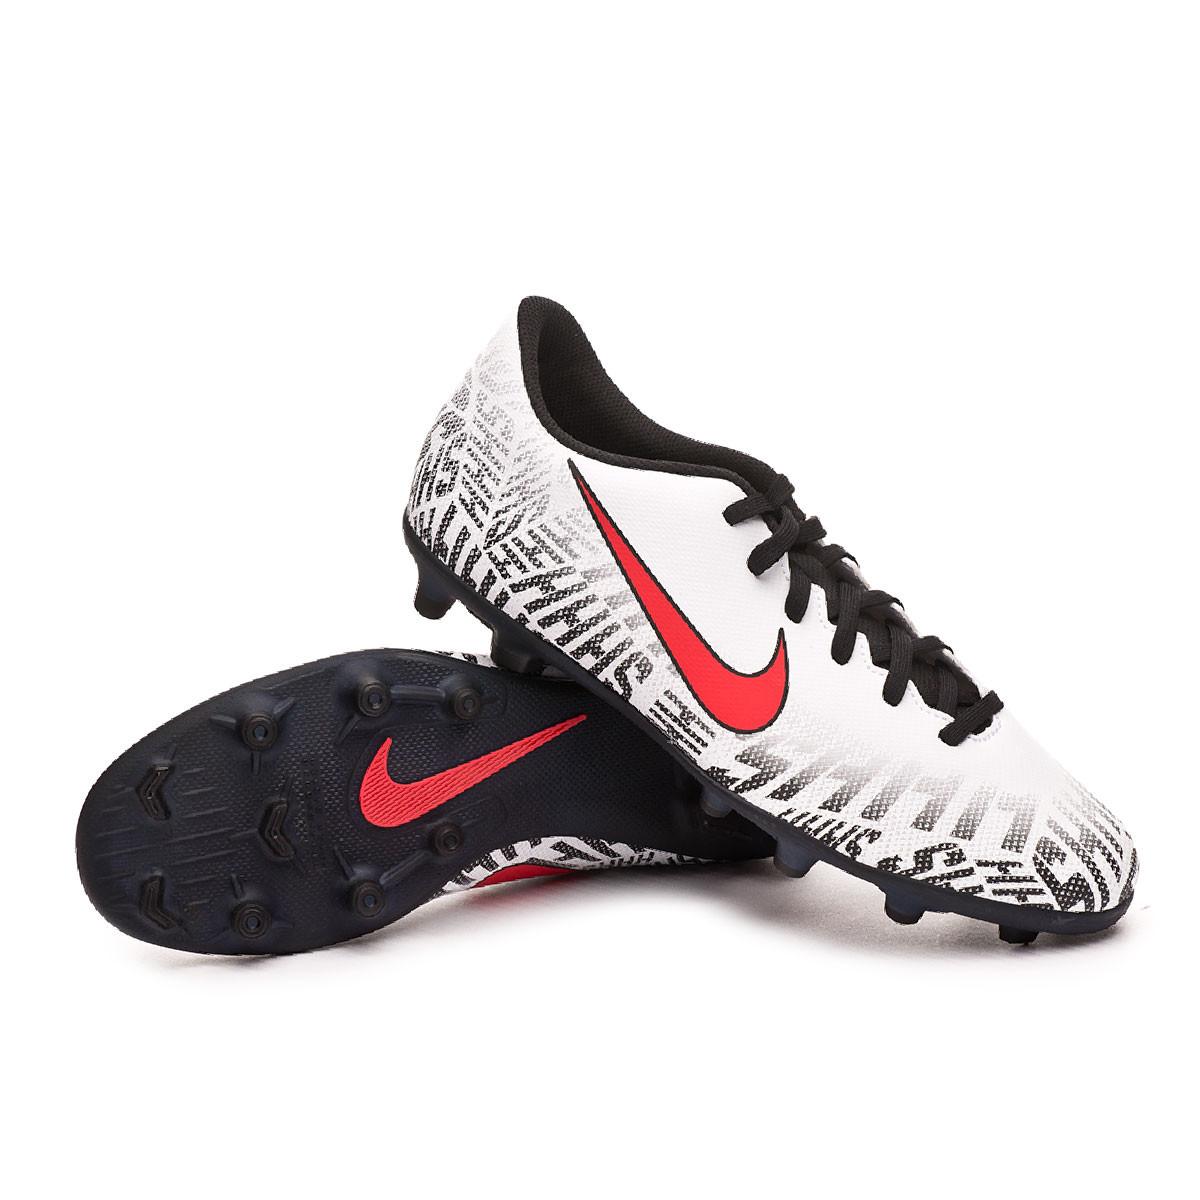 1d1d0014cbf10 Zapatos de fútbol Nike Mercurial Vapor XII Club Neymar Jr MG  White-Challenge red-Black - Tienda de fútbol Fútbol Emotion